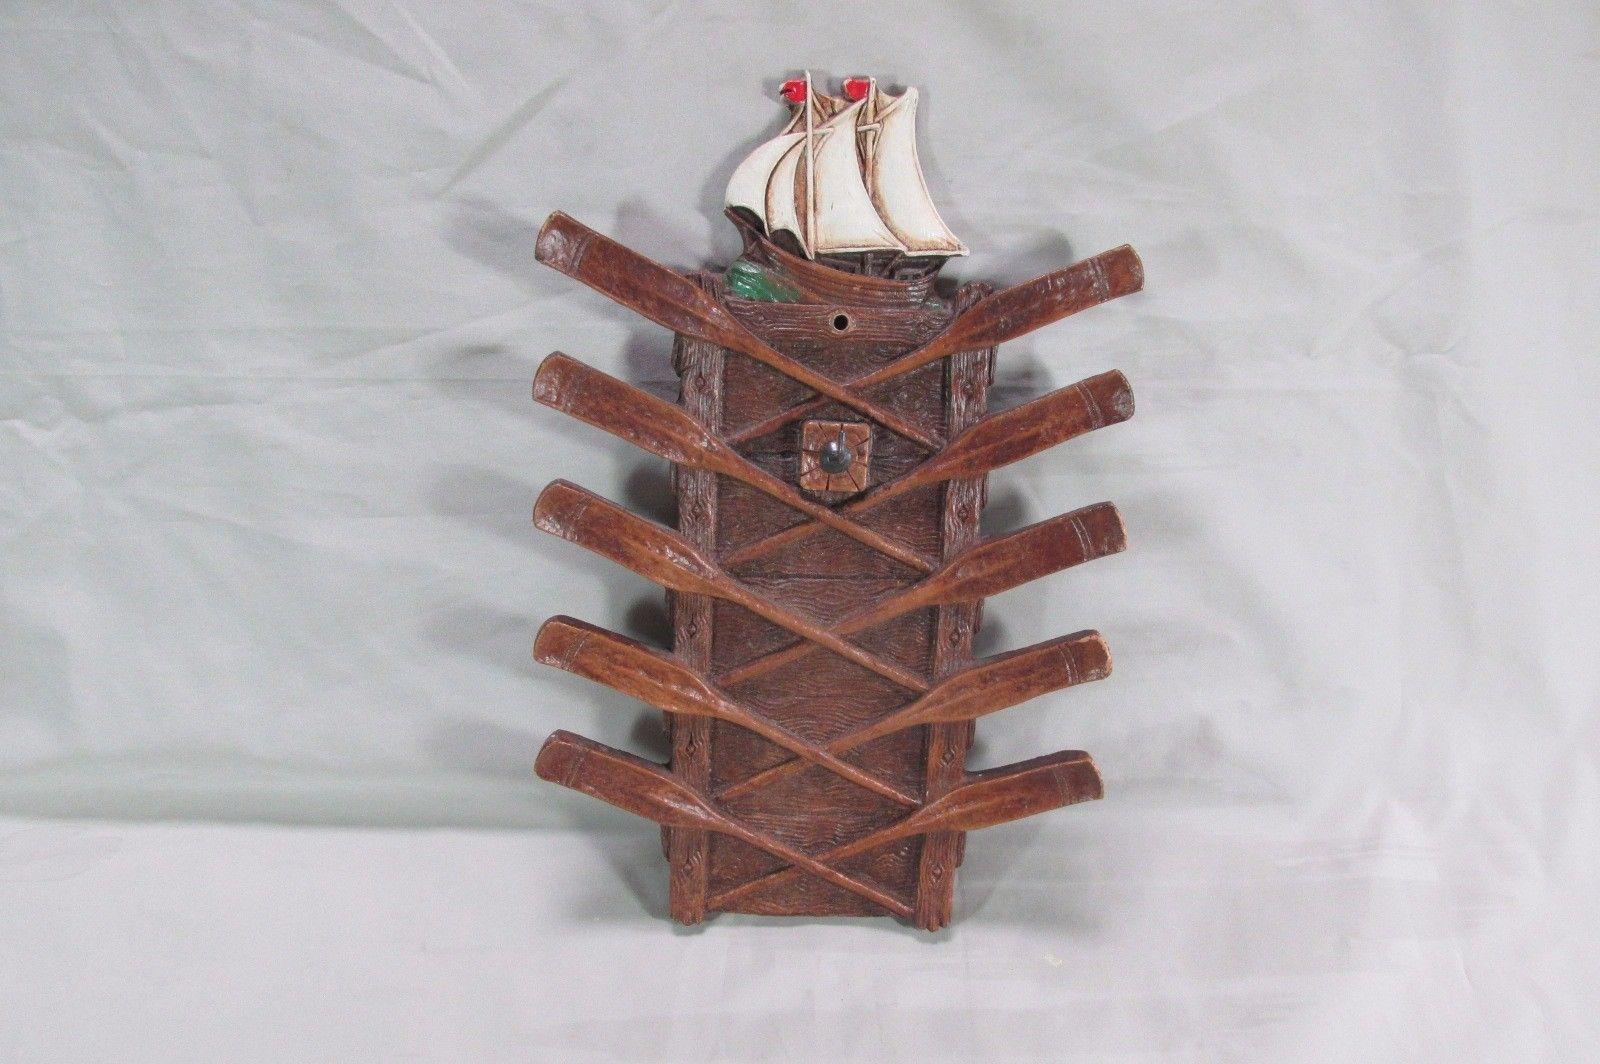 Very Nice Syroco Wood Nautical Wall Hanging Neck Tie Holder, Schooner, Oars